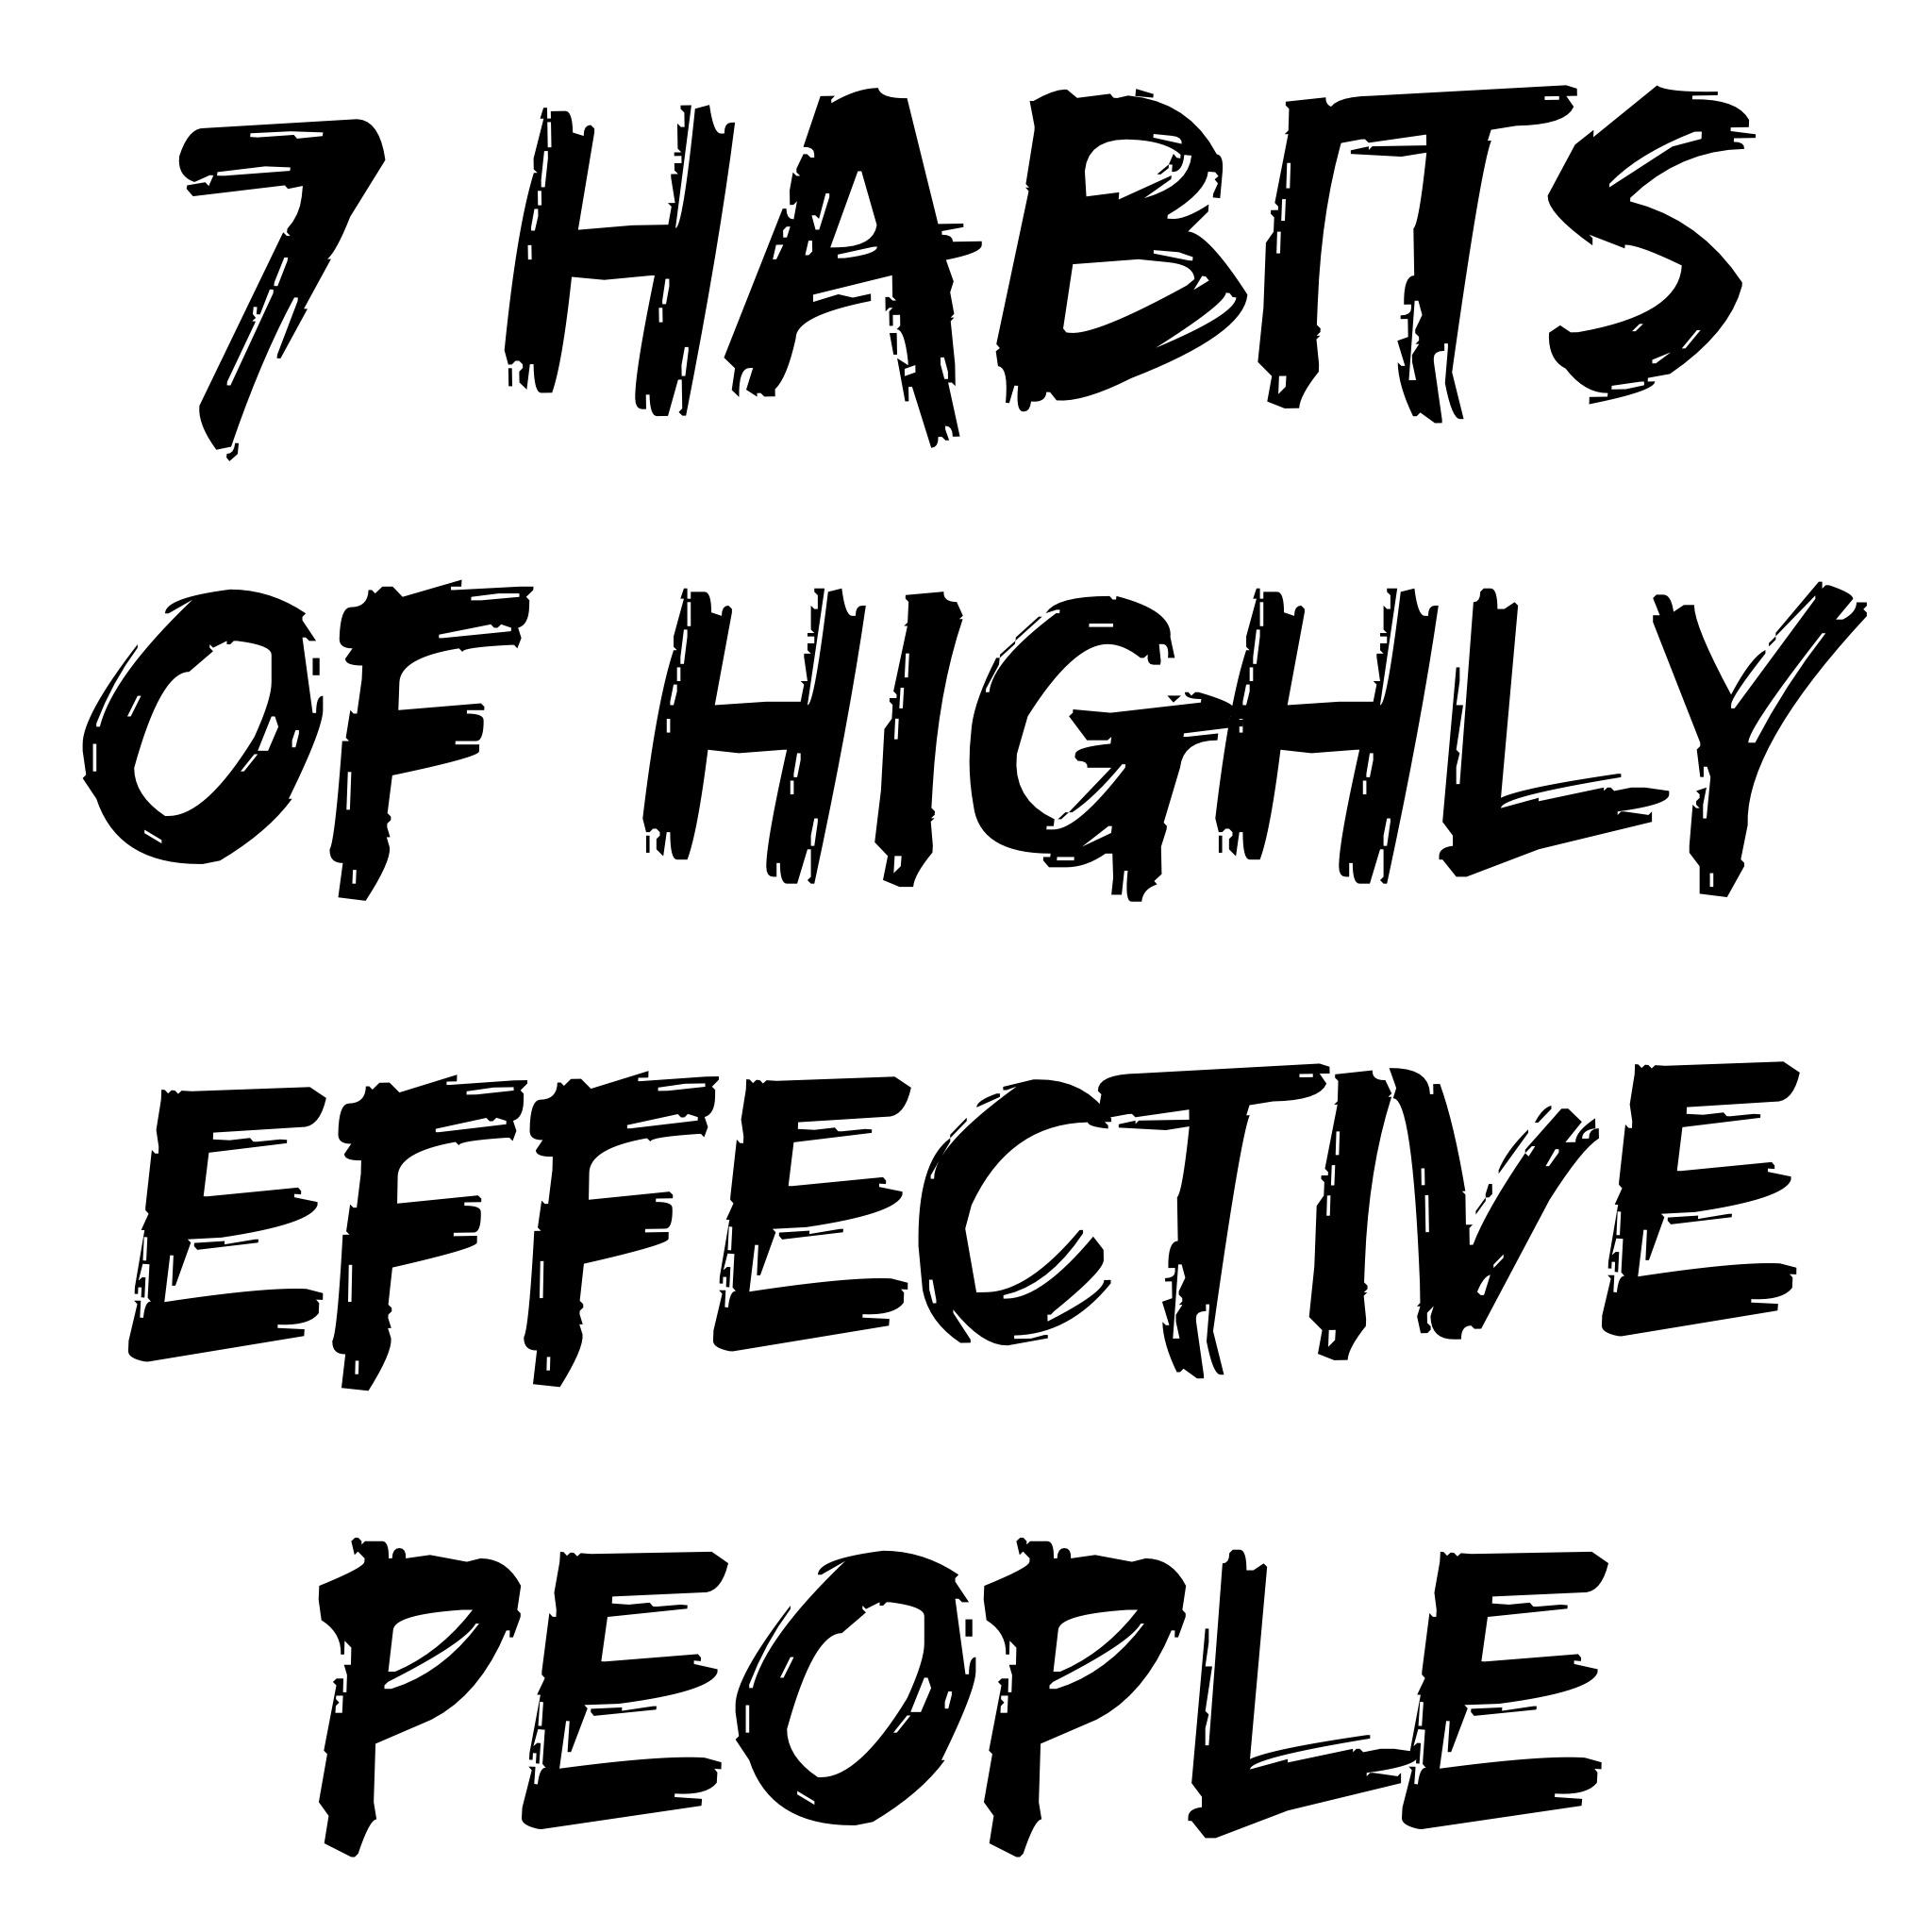 7 Habits of Highly Effective People vs Ineffective People